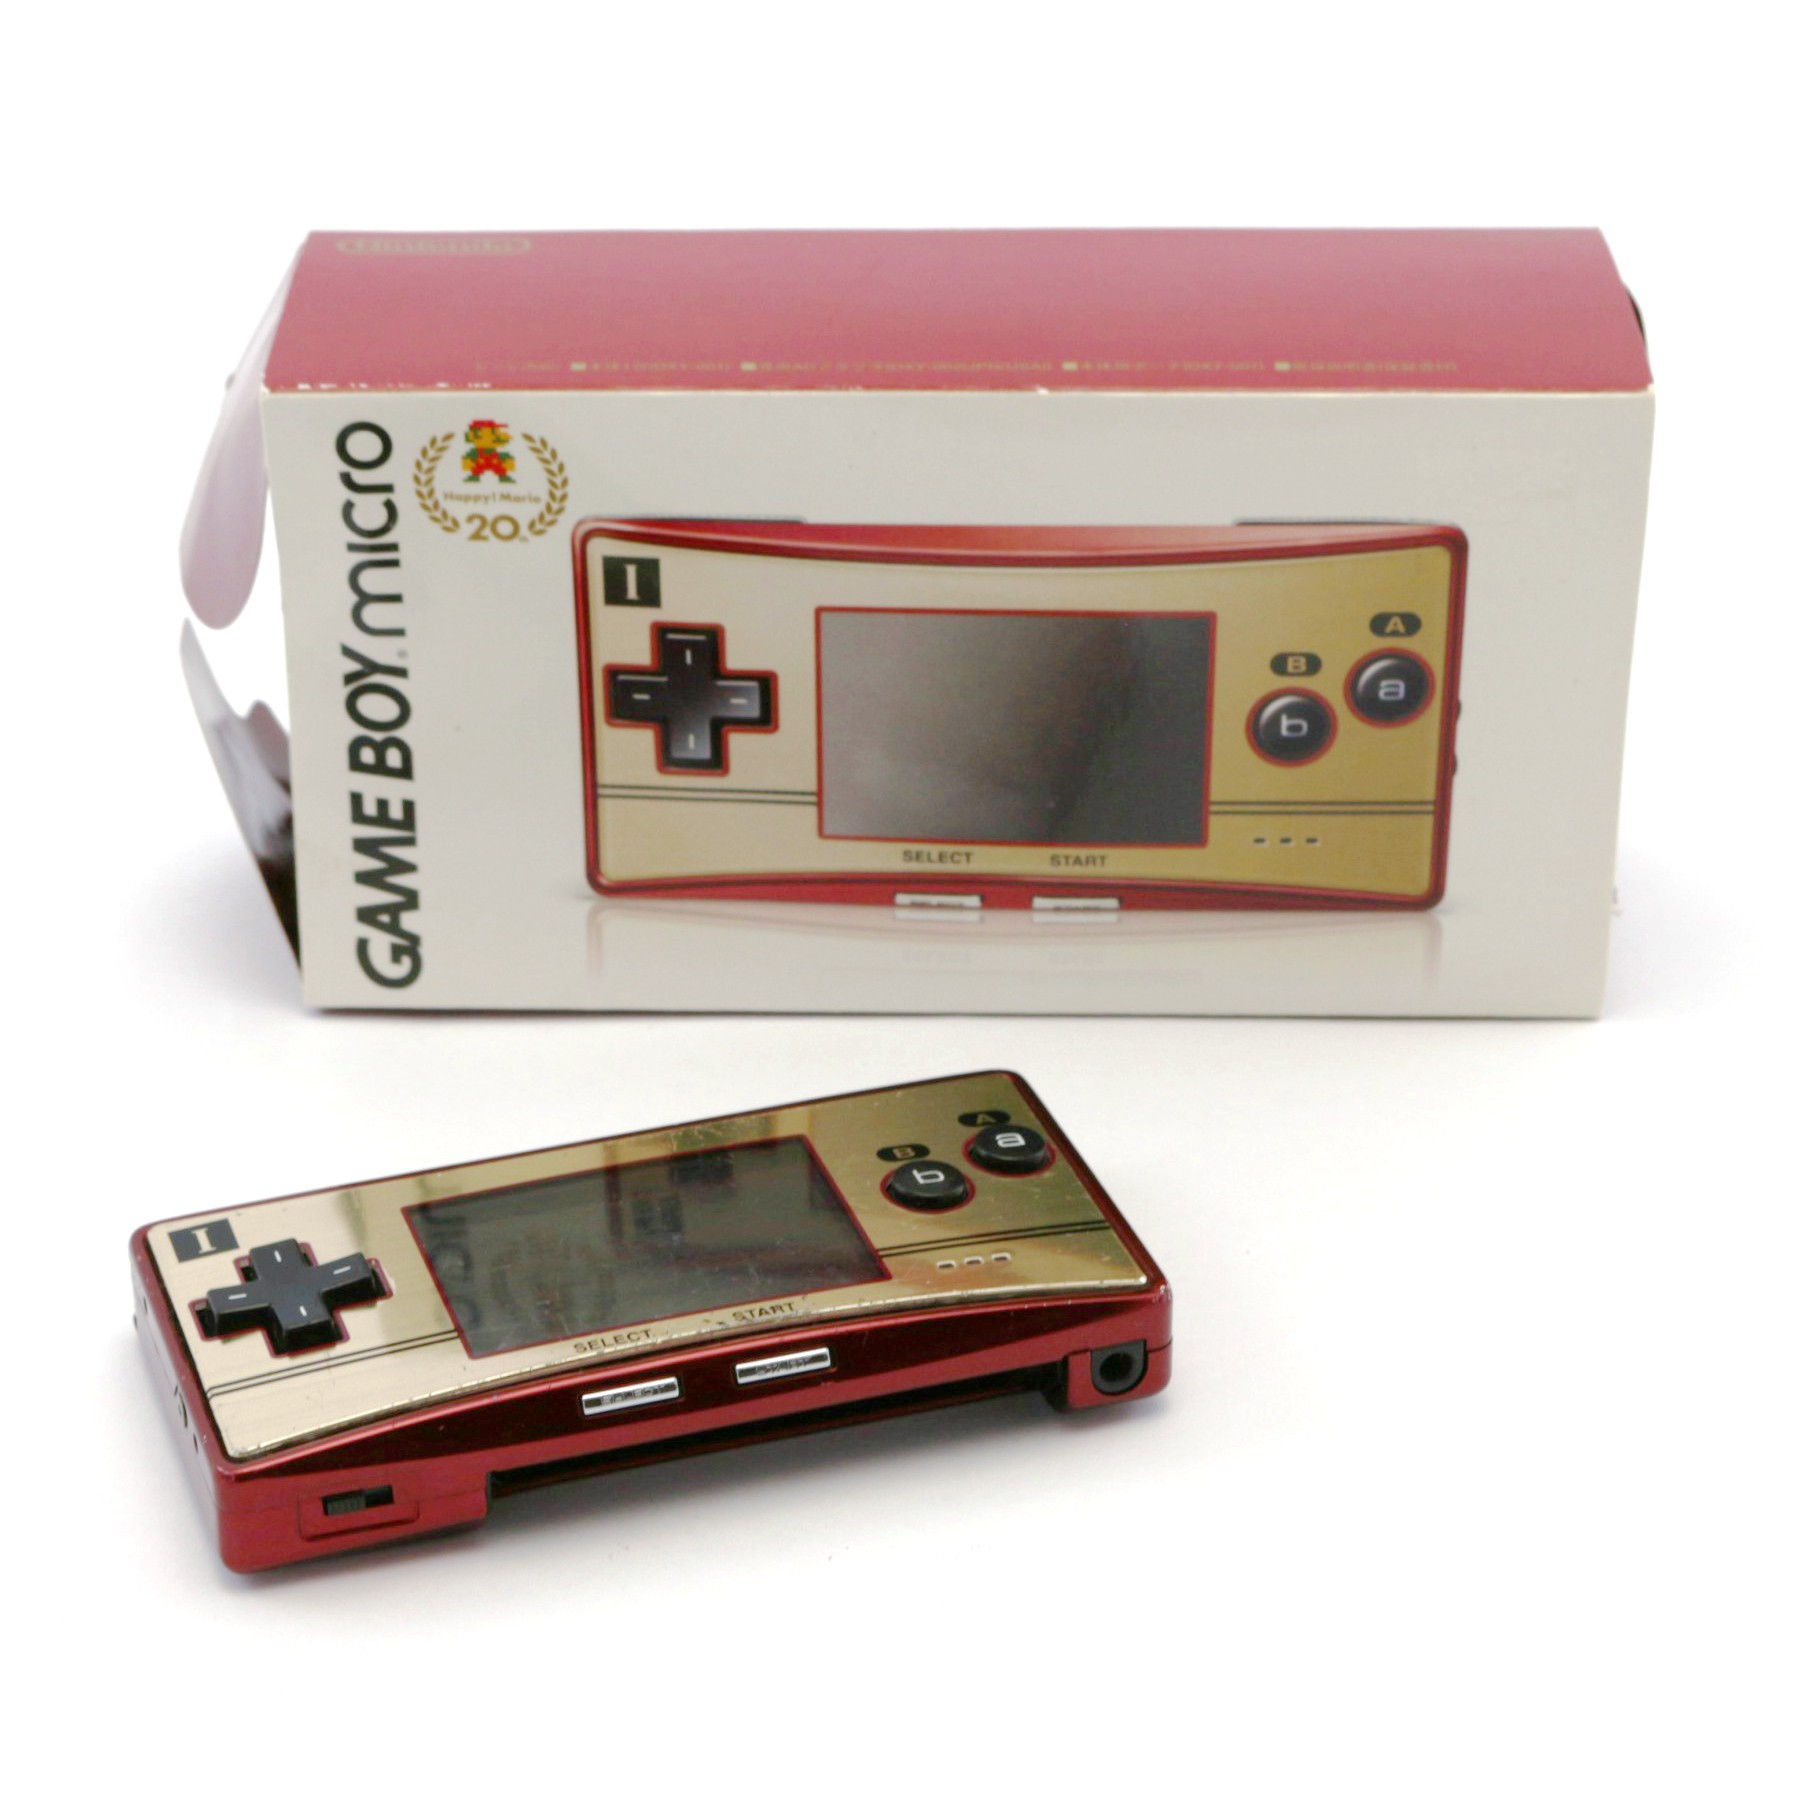 Konsole #Famicom Happy Mario 20th Anniv. + Netzteil